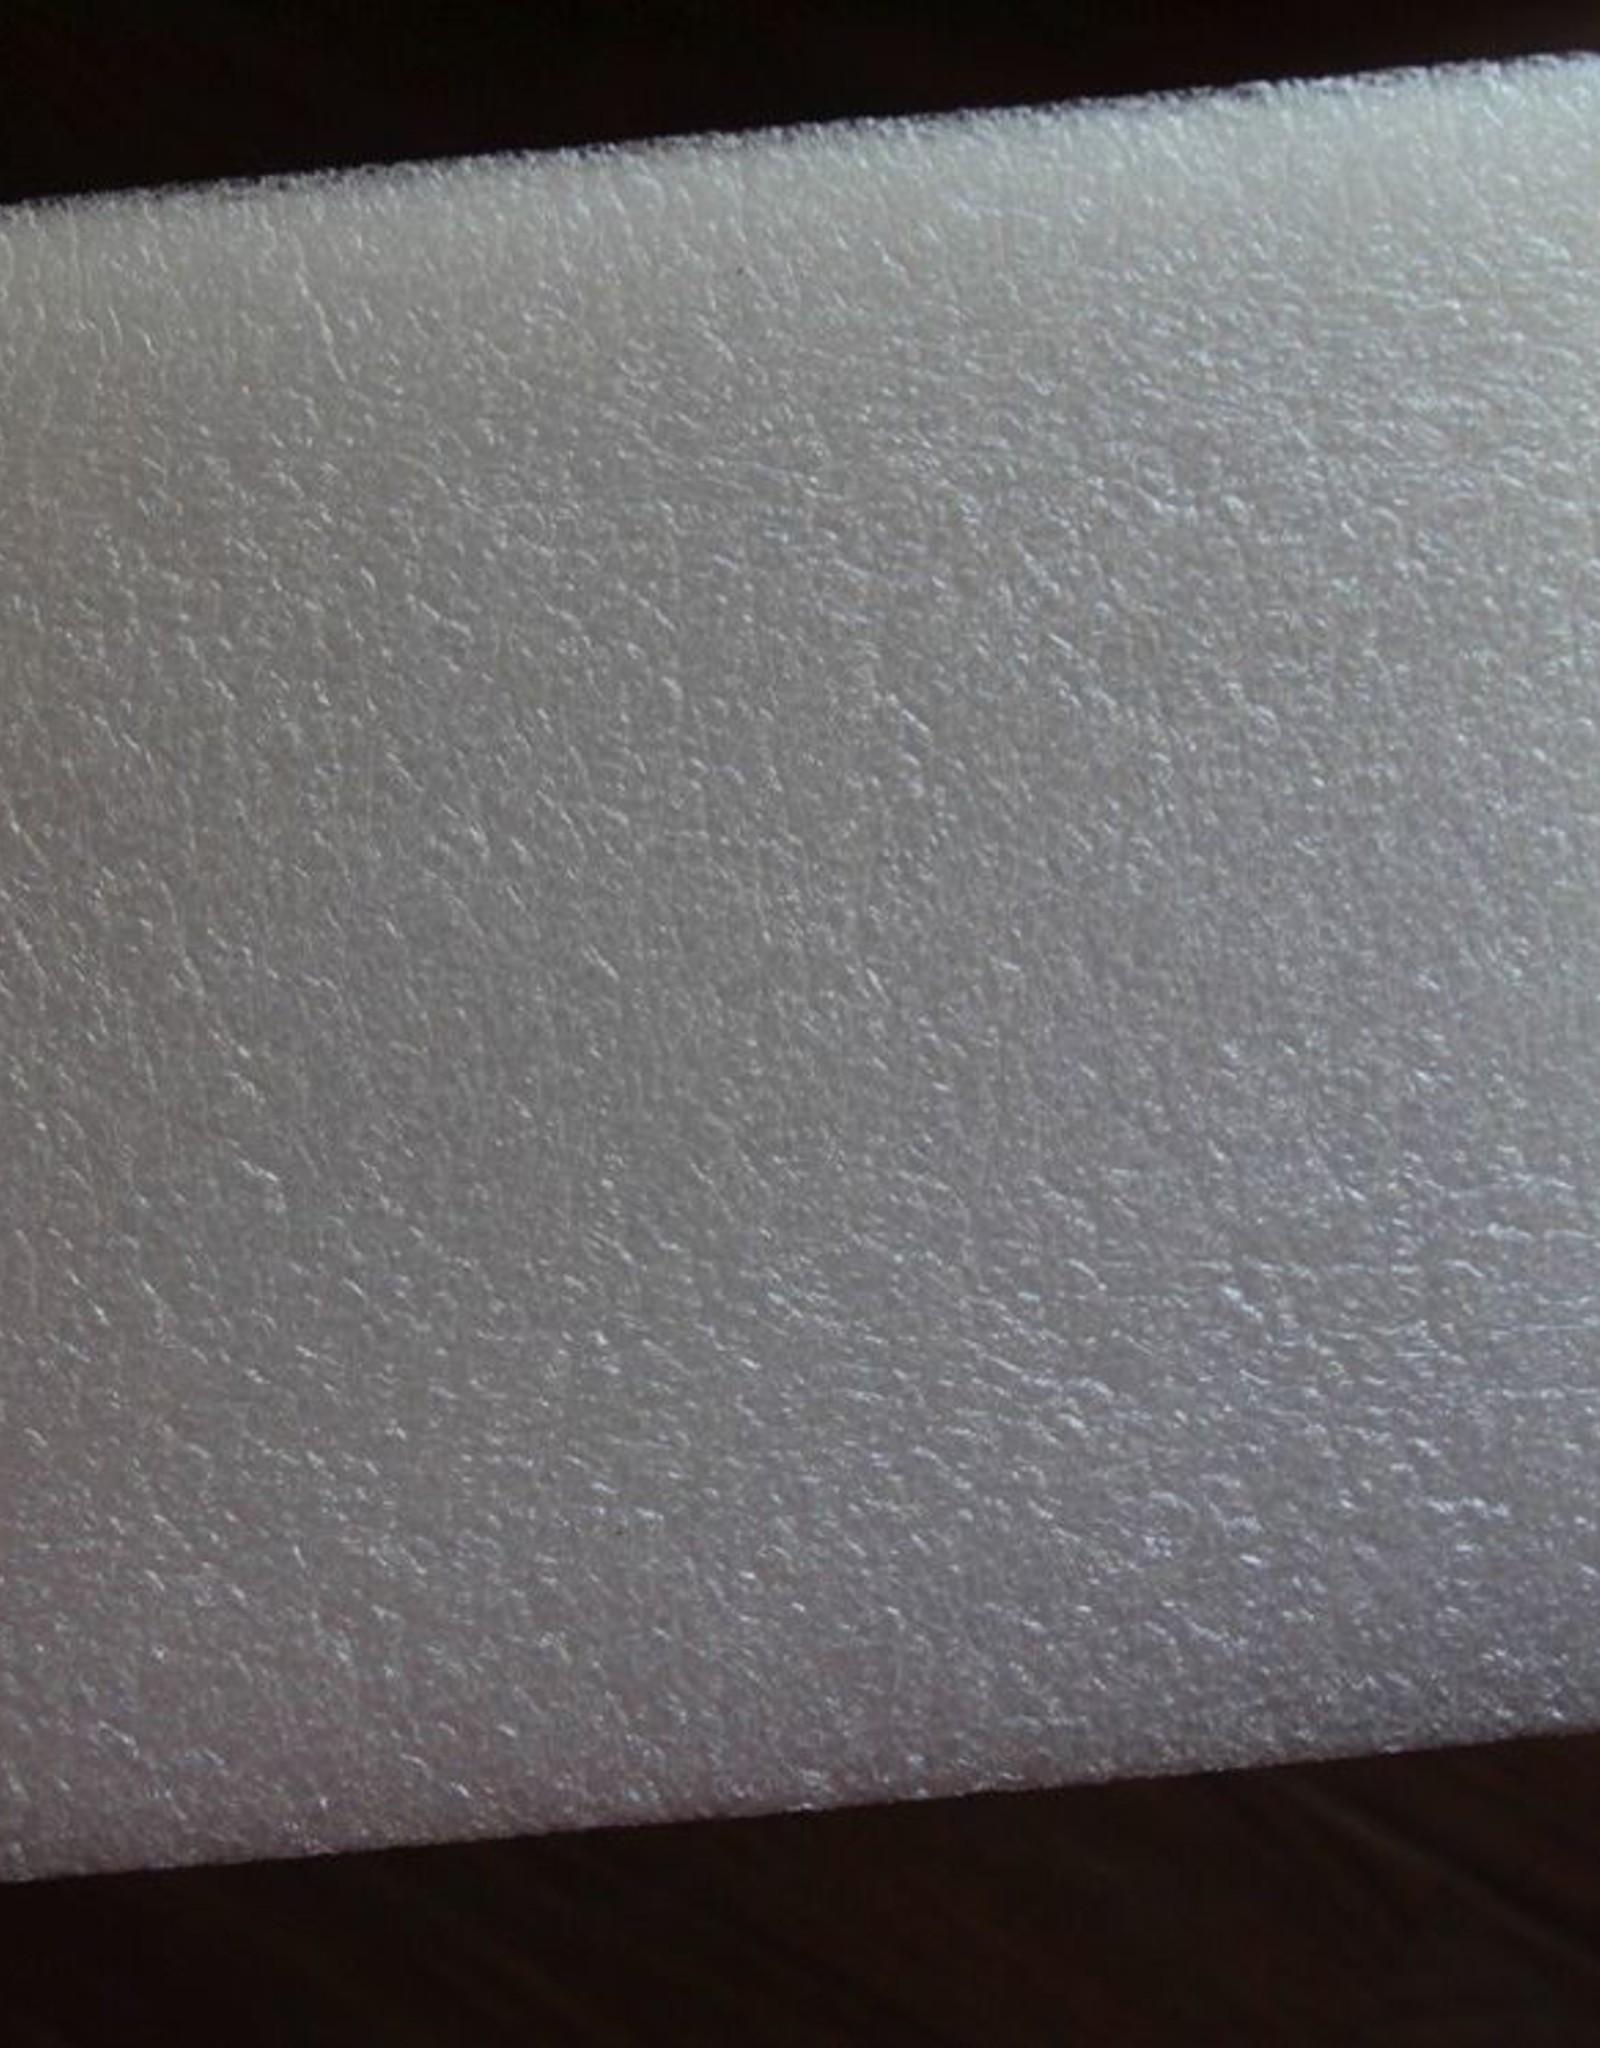 "Colonial Felting Foam 9x8x2"" pad"